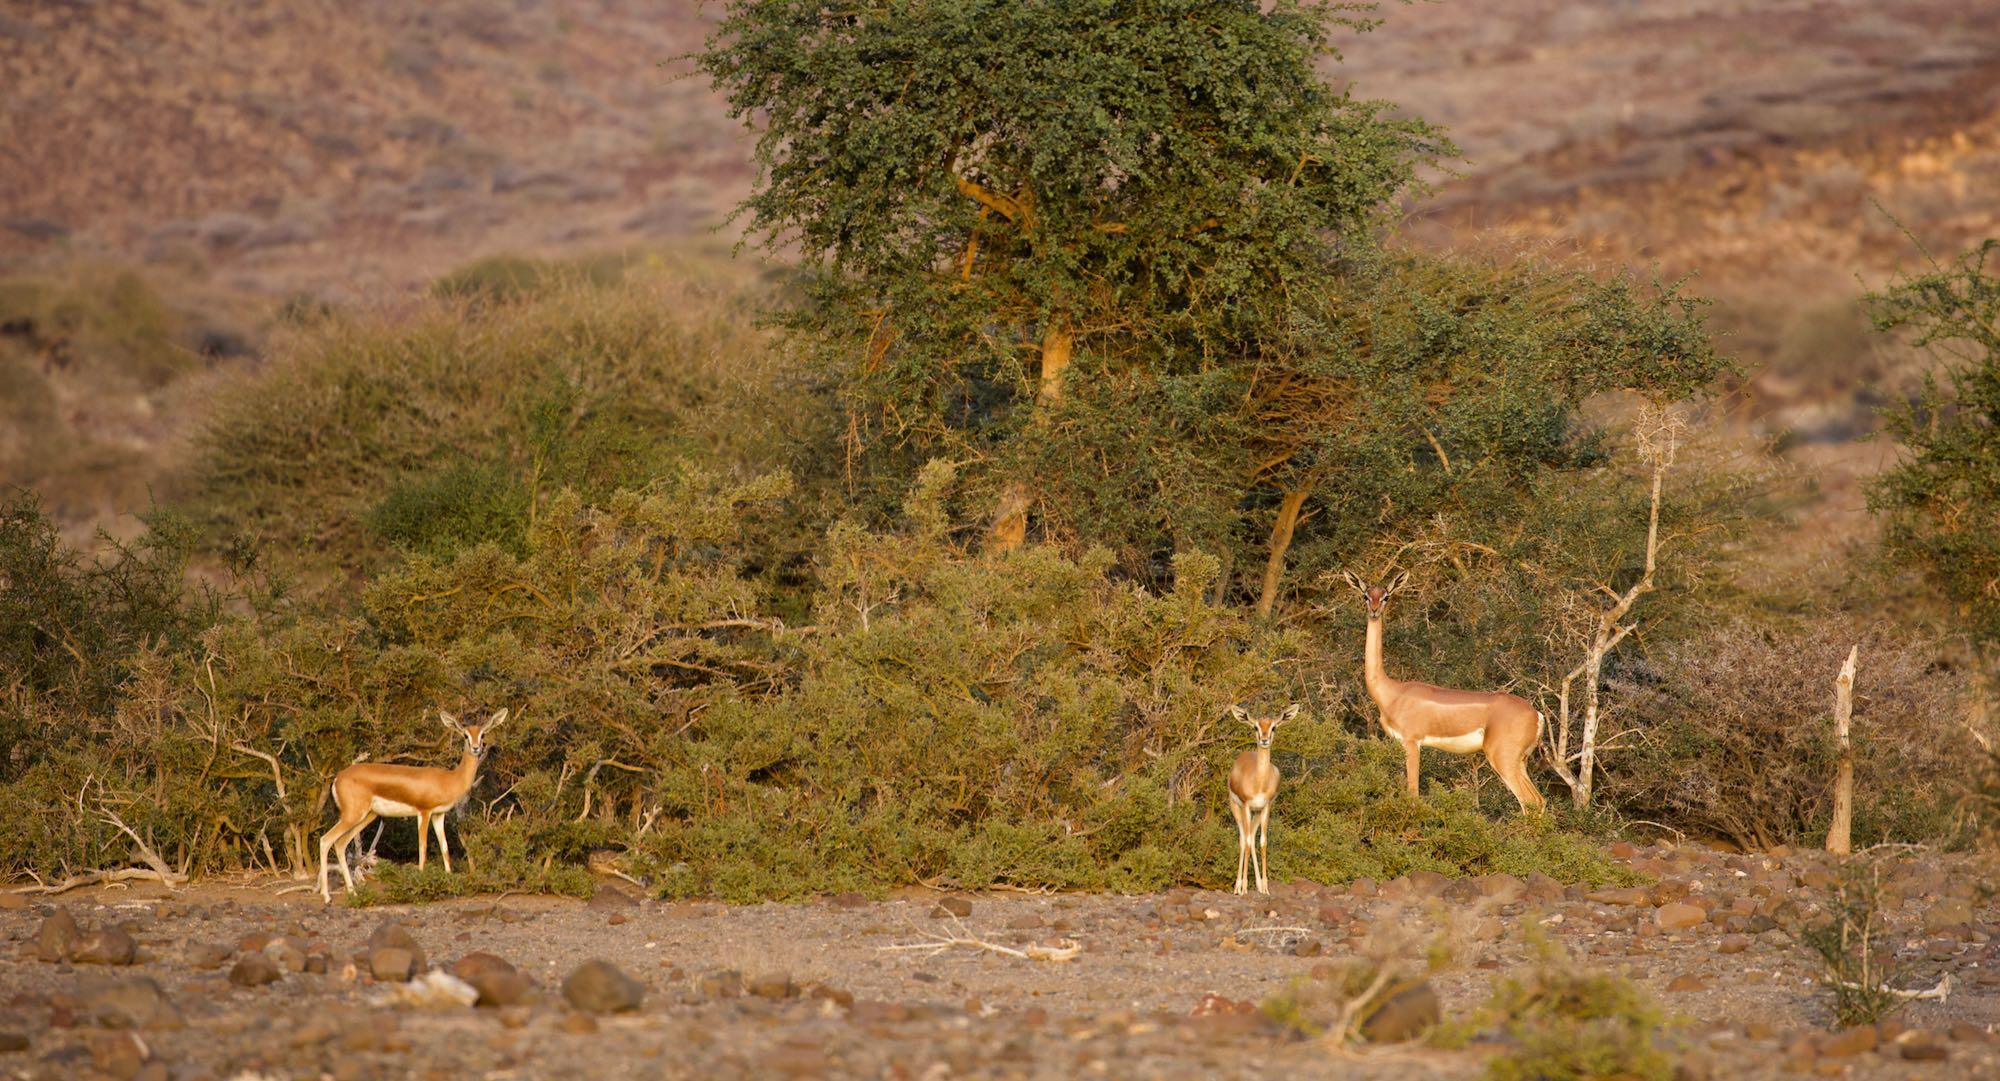 decan assamo gazelle girafe gazelle de pelzeln